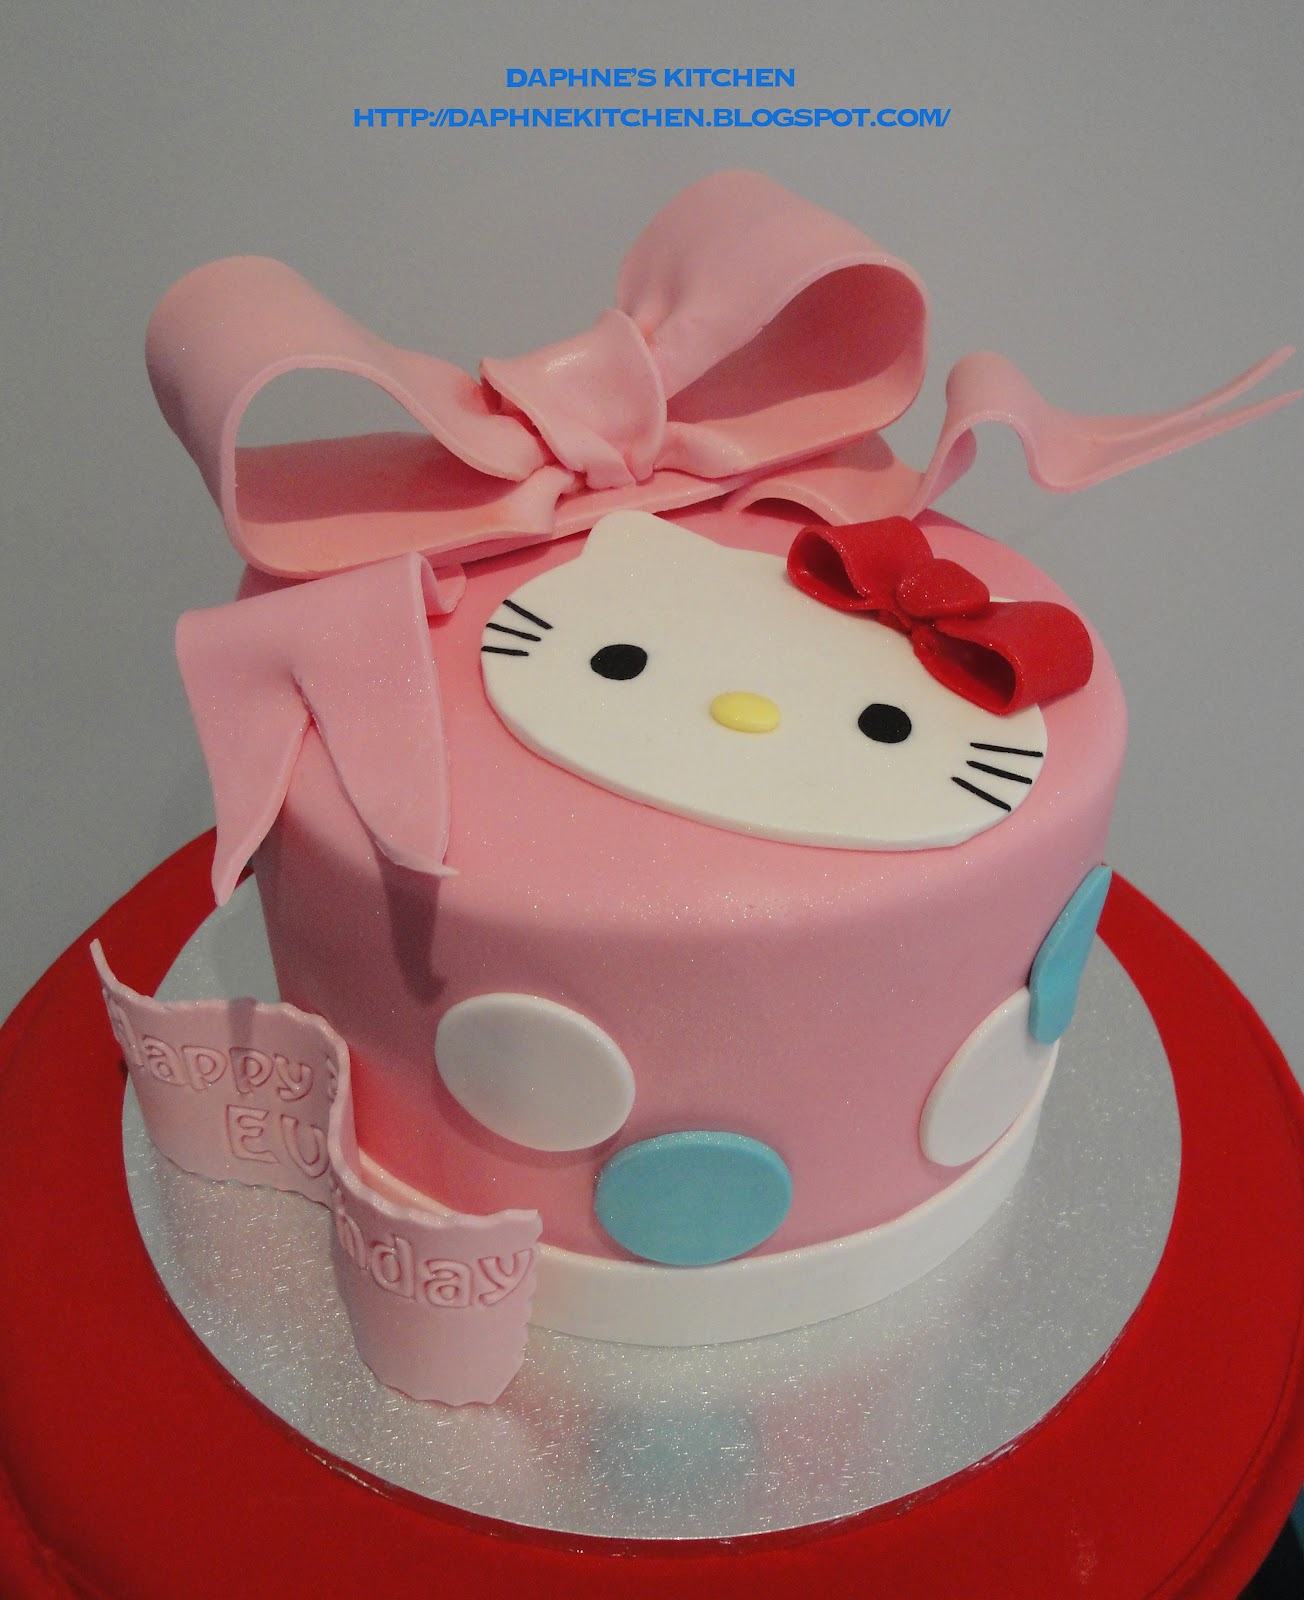 Cake Hello Kitty Blue : Daphne s Kitchen: Hello Kitty Cake